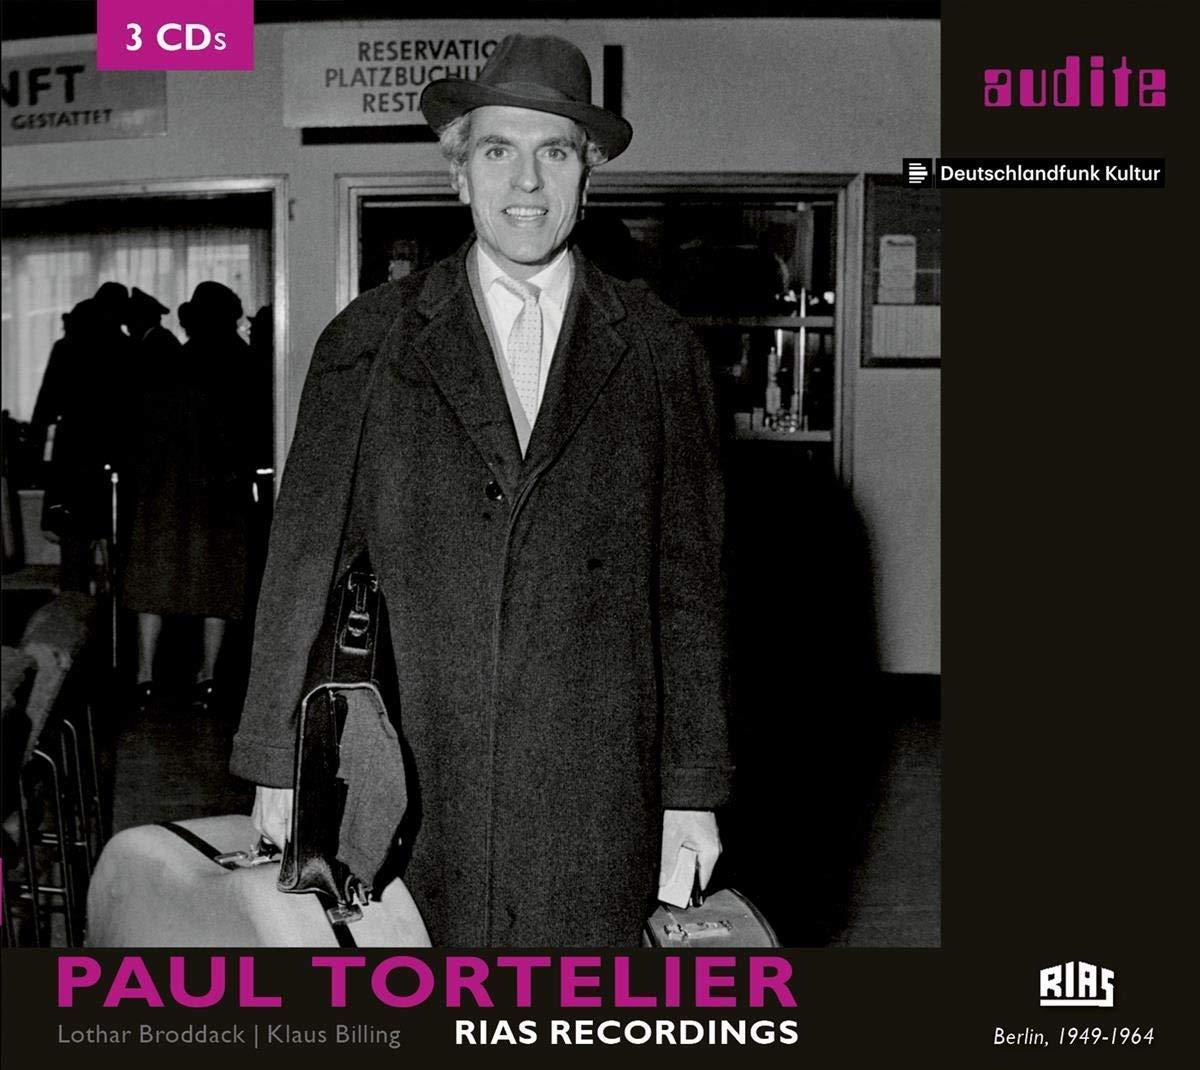 Review of Paul Tortelier: RIAS Recordings